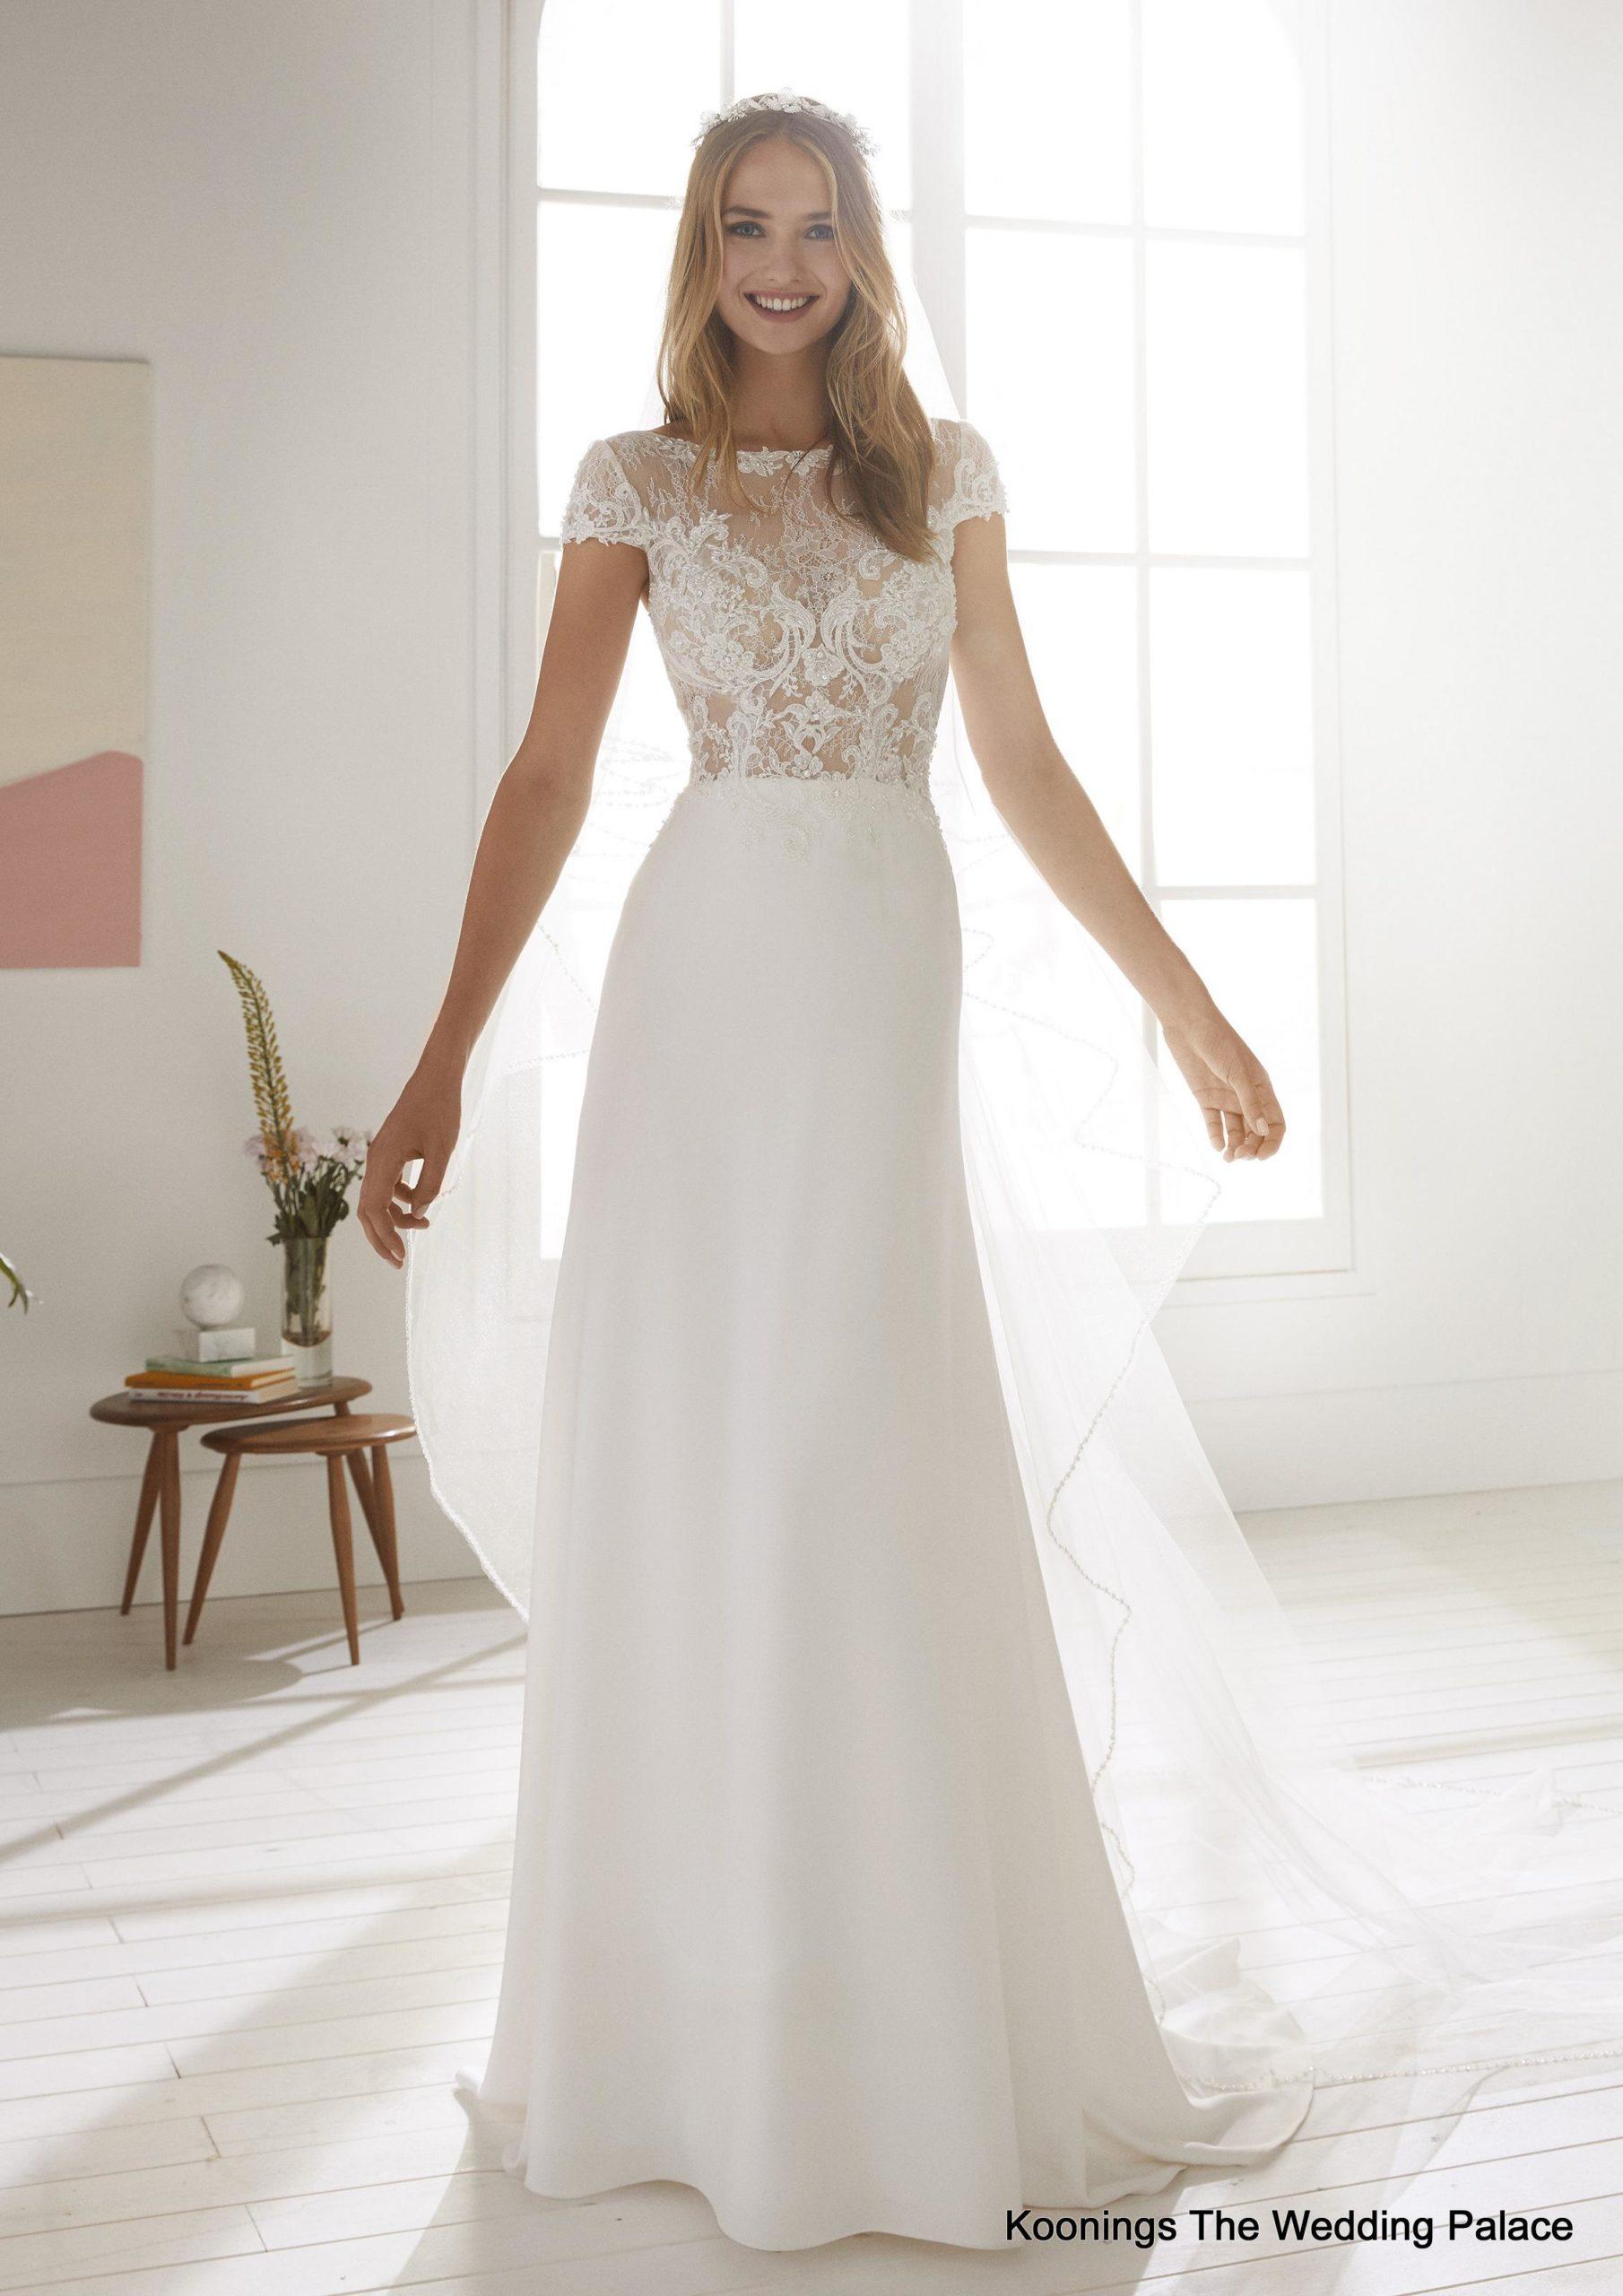 white-one-by-st-patrick-hochzeitskleid-obre-white-one-essentials31979_68376_b-scaled